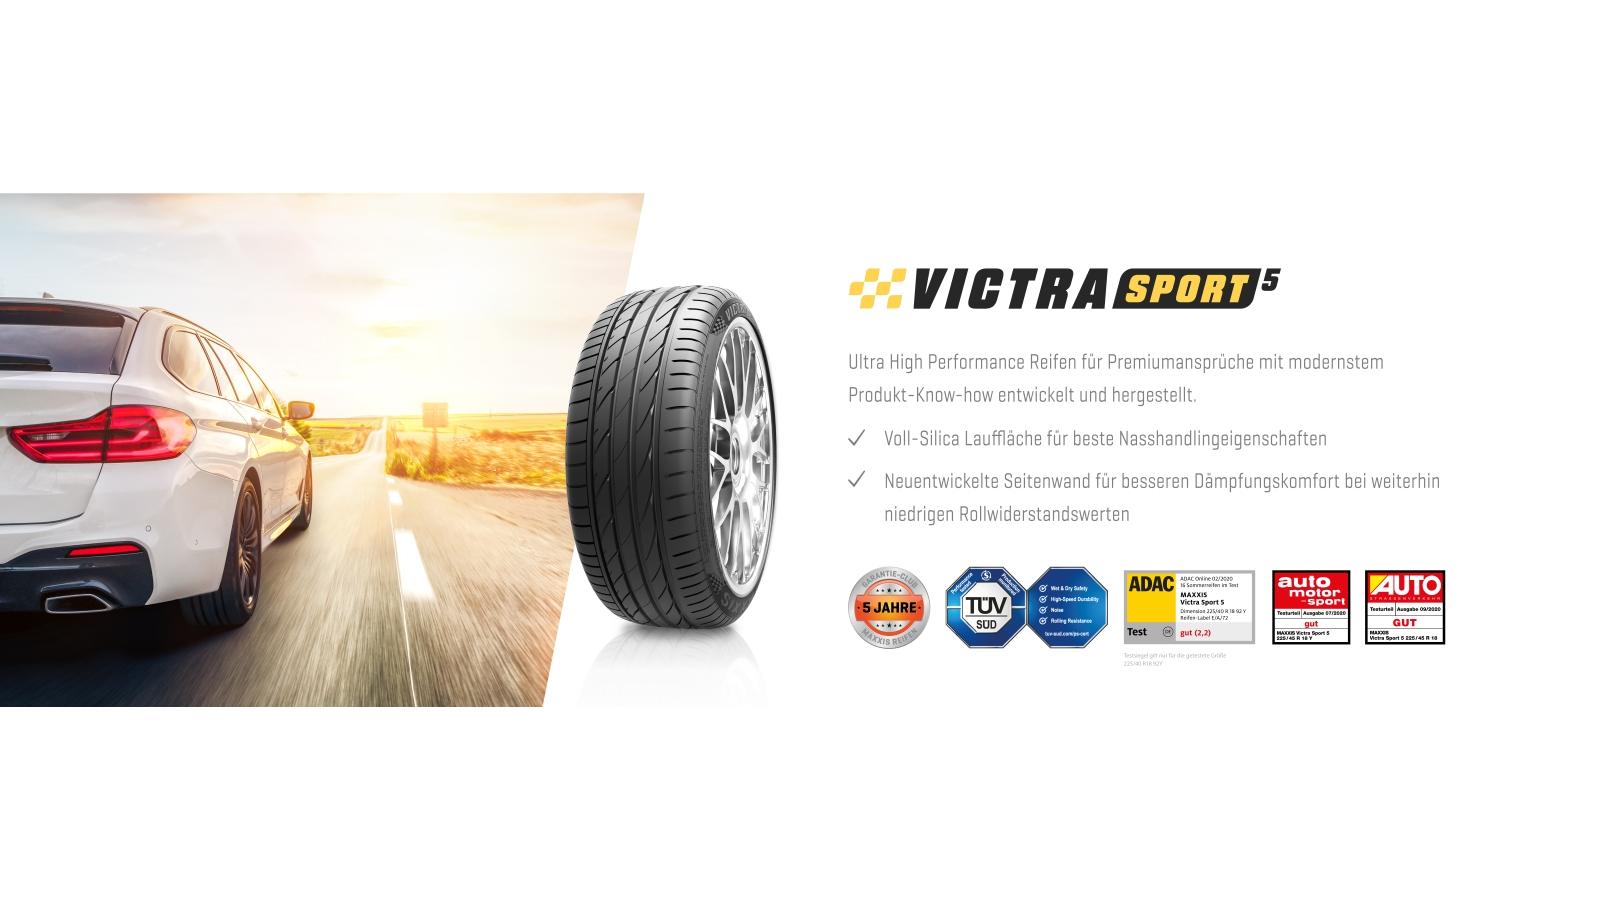 Victra5_1600x900